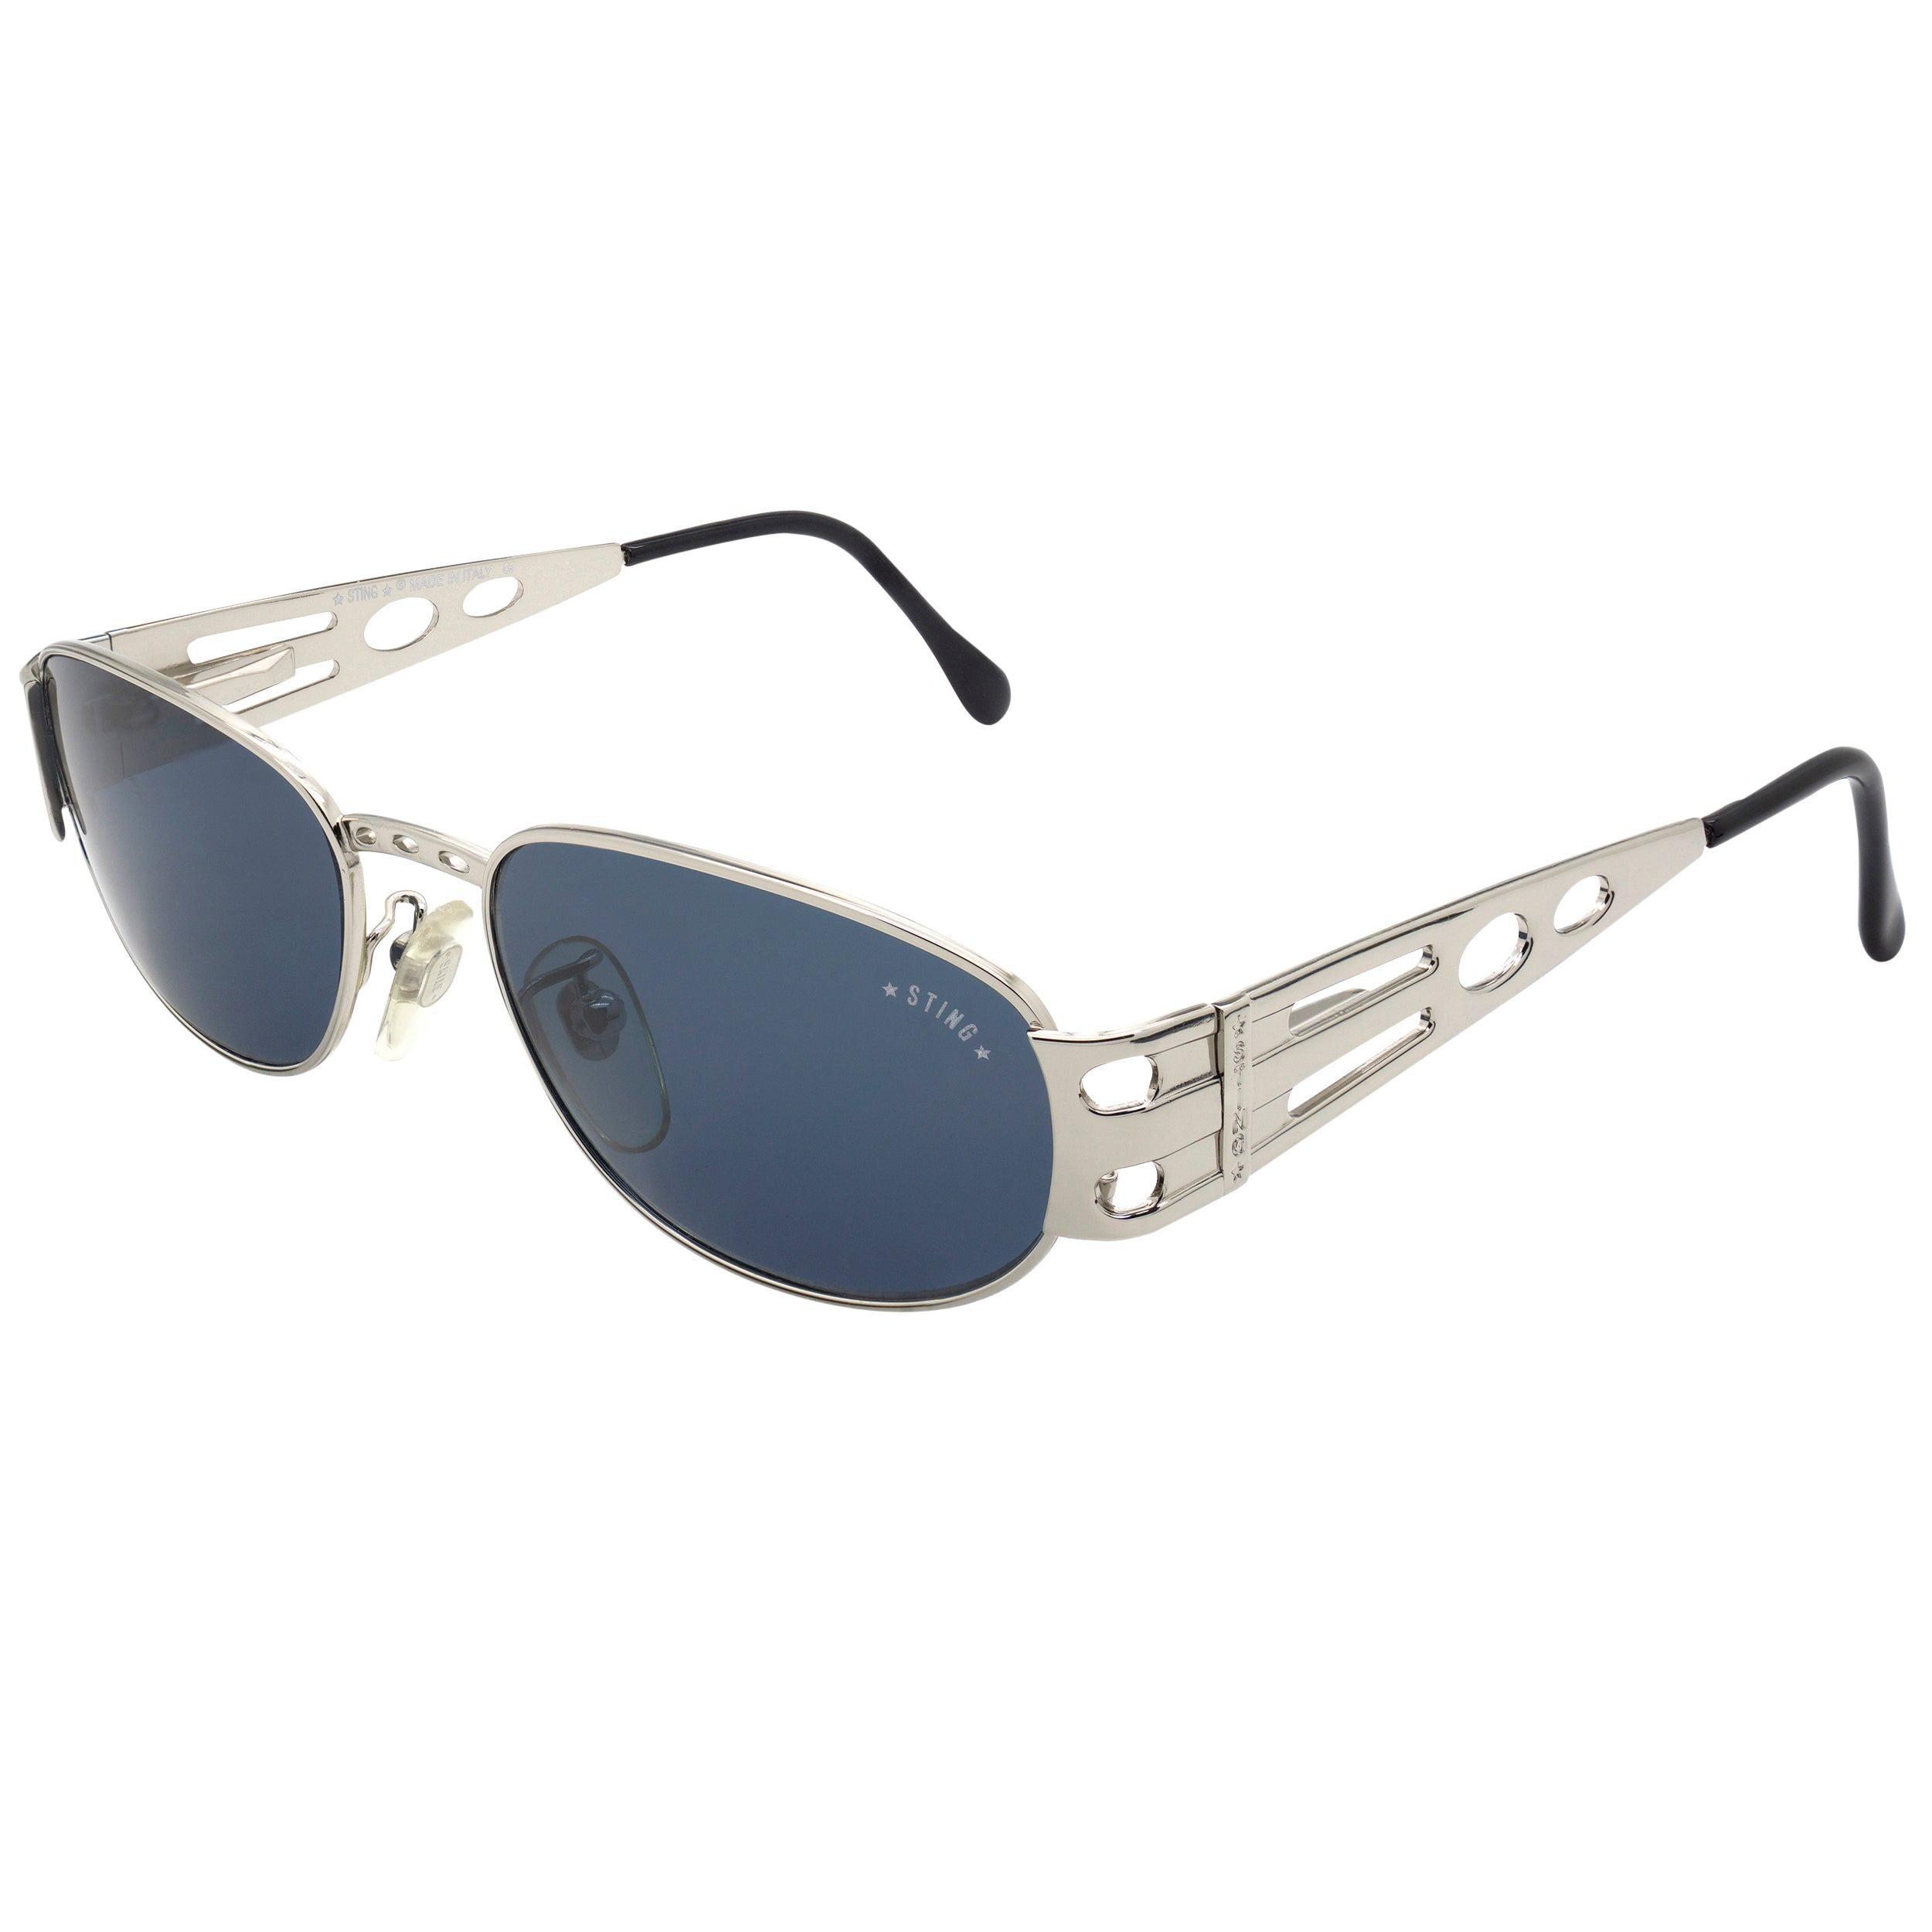 Sting vintage sunglasses steampunk